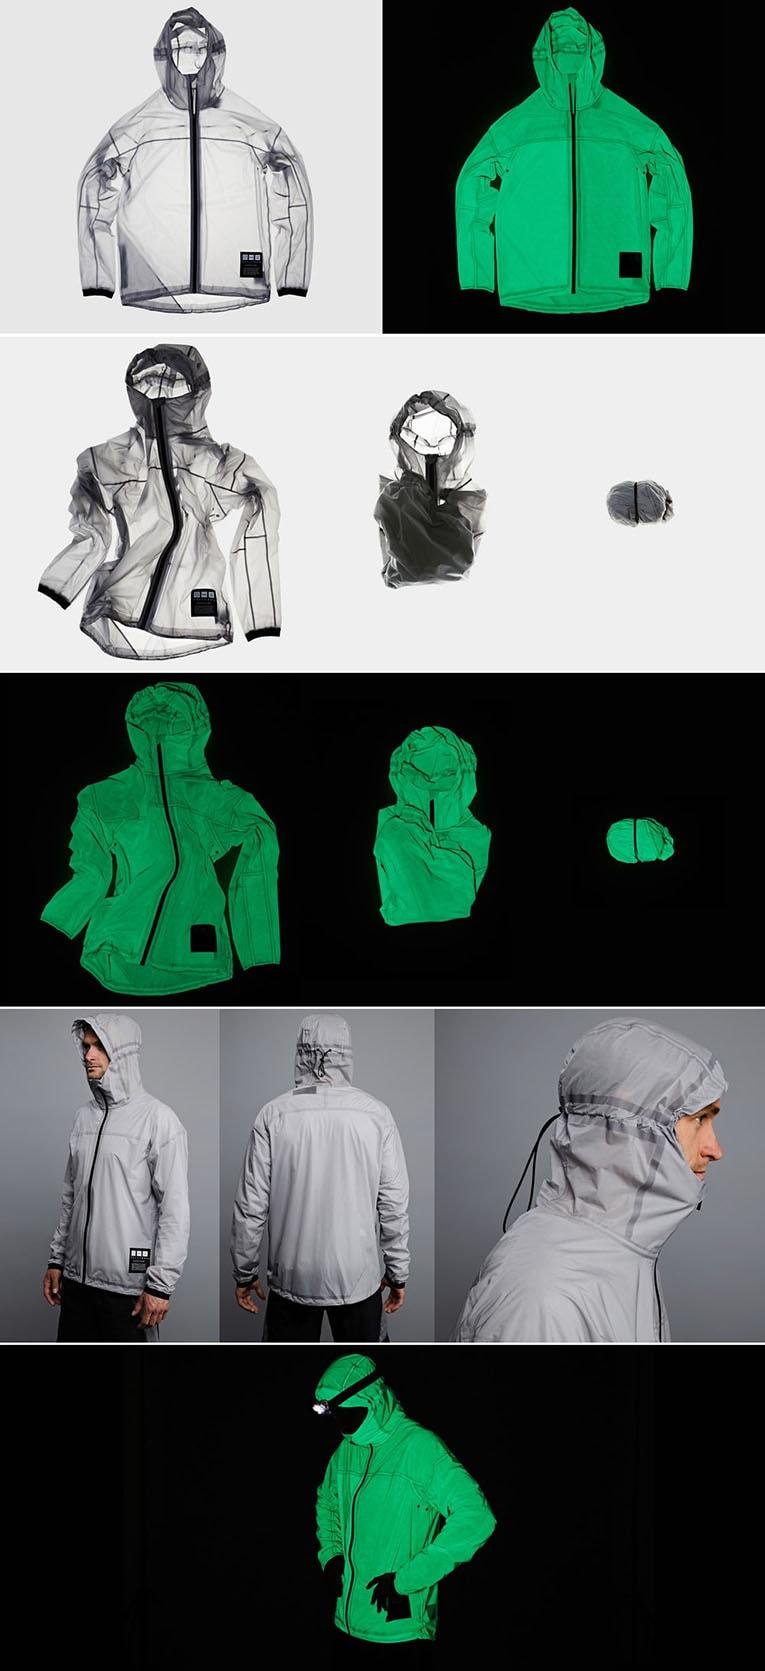 Vollebak lança jaqueta alimentada por luz solar e artificial que brilha no escuro como kryptonita stylo urbano